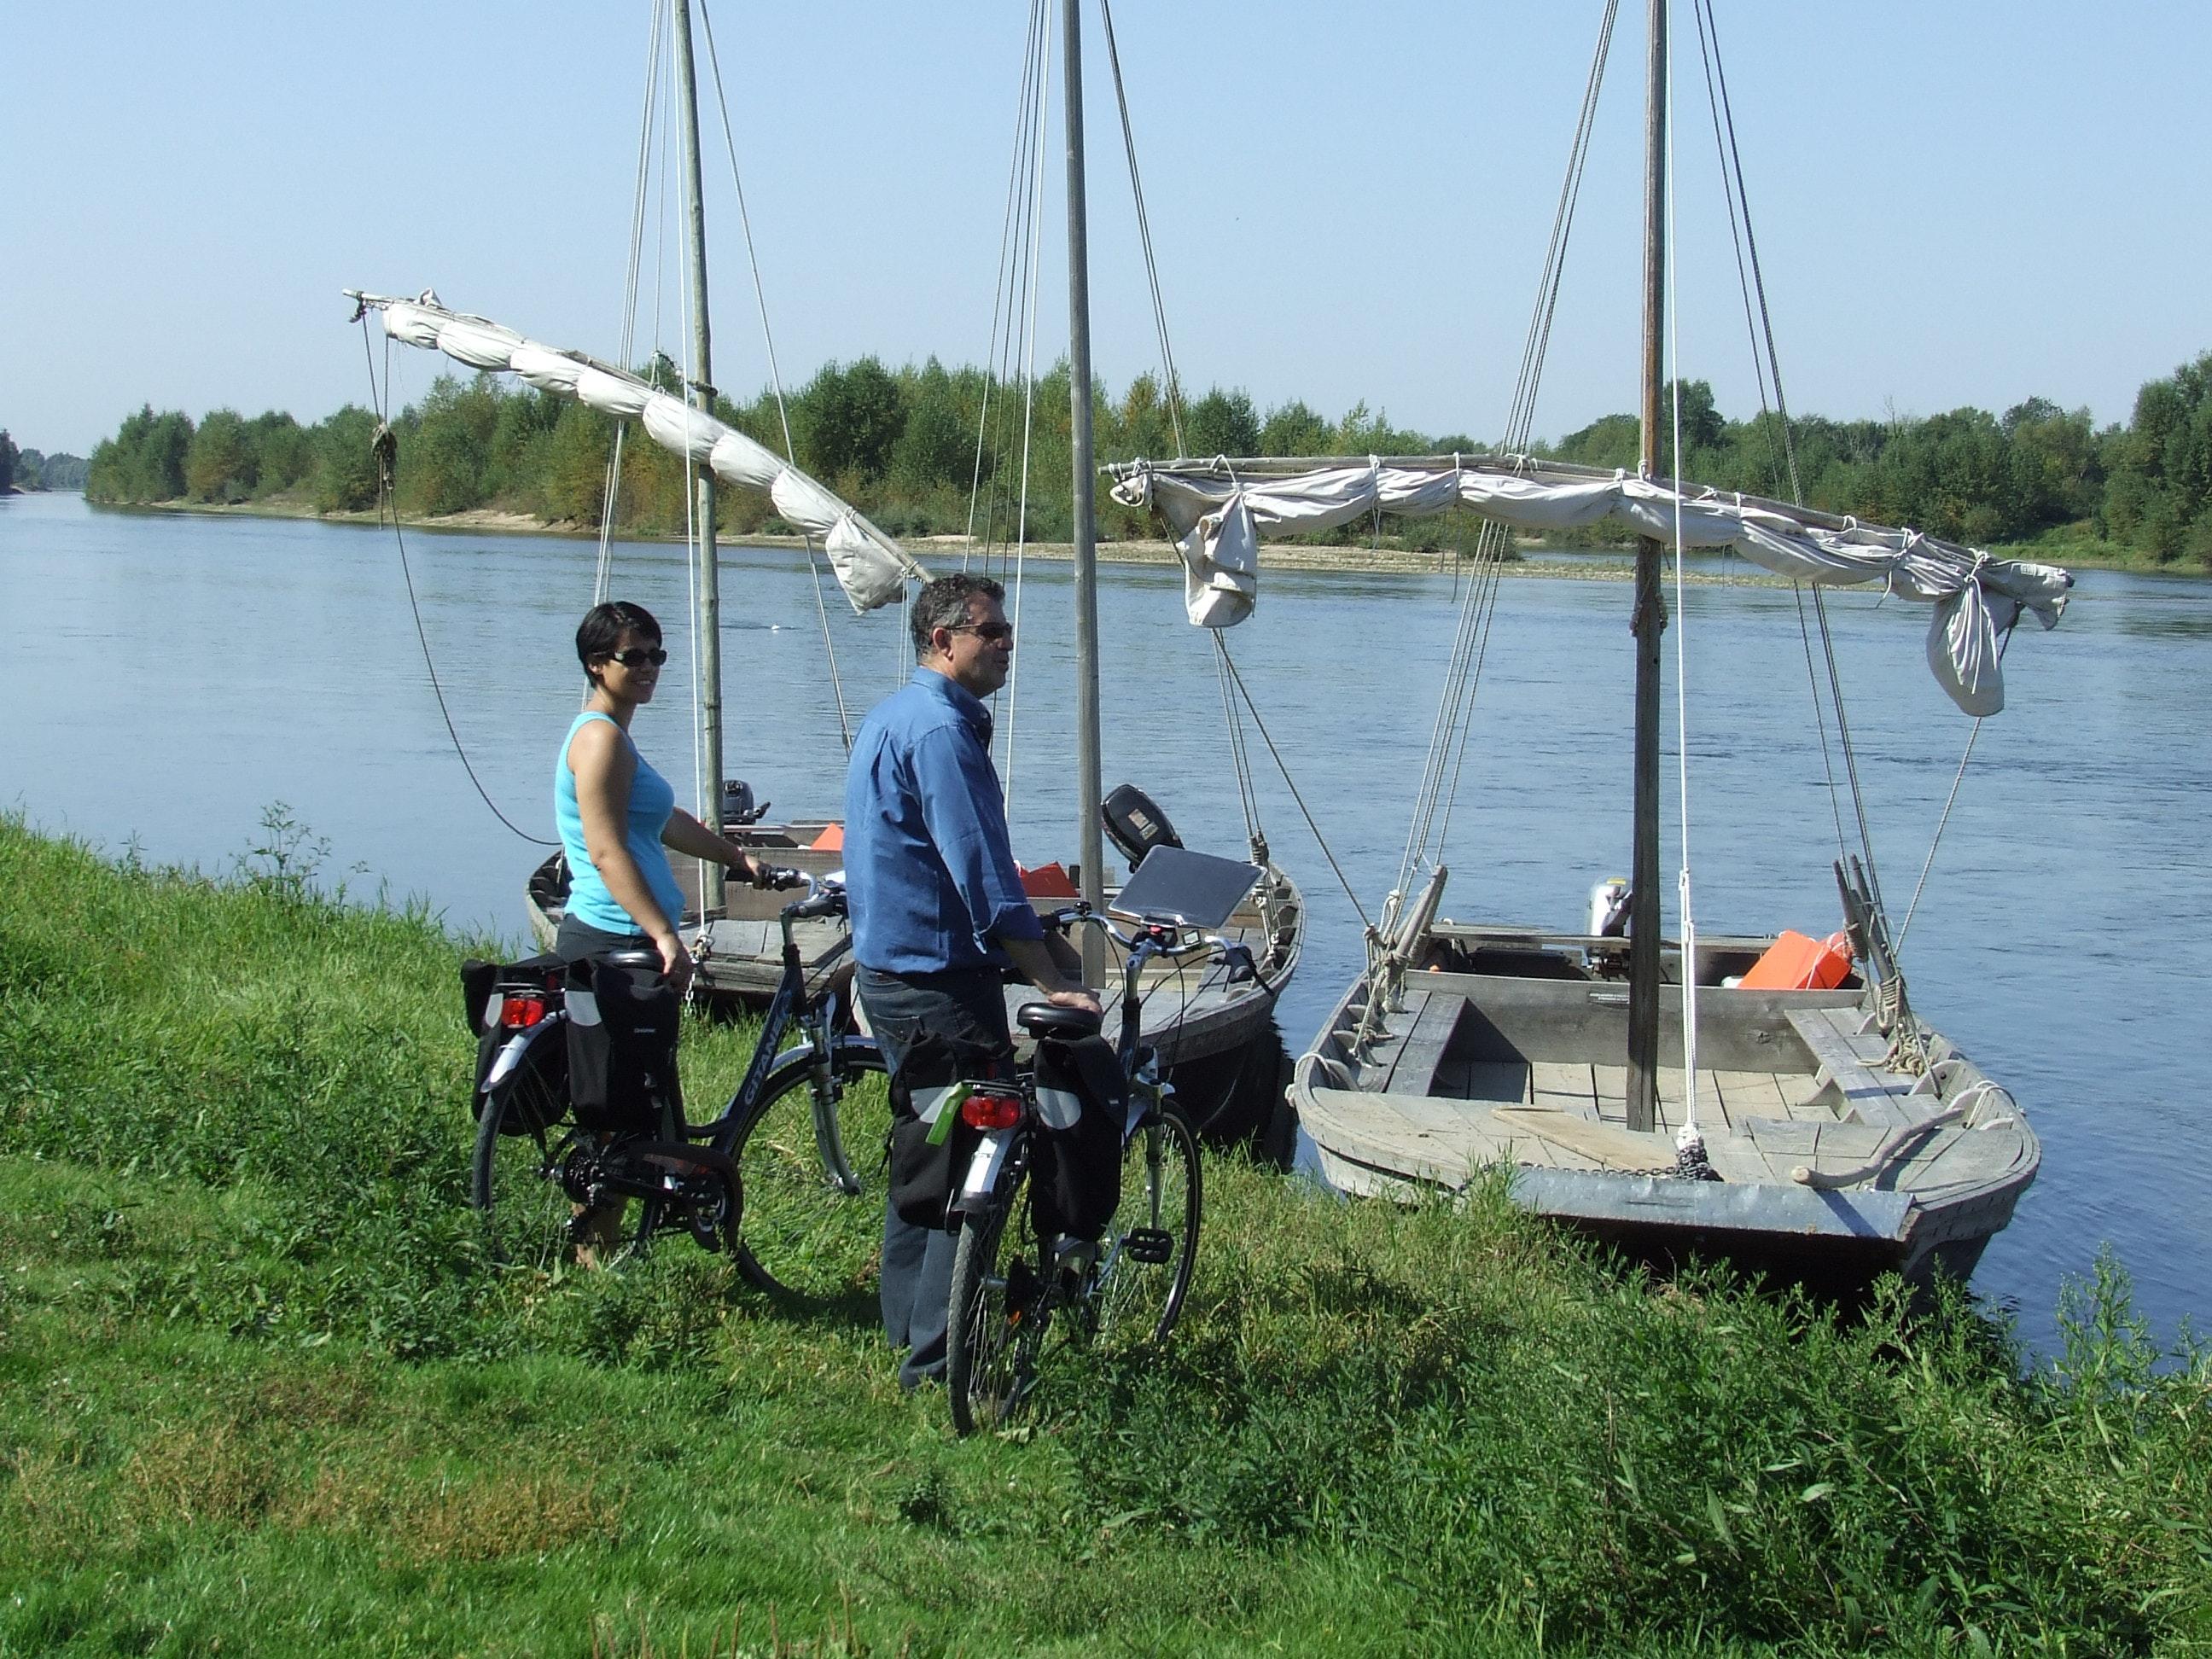 Loire à Vélo fietsers boot